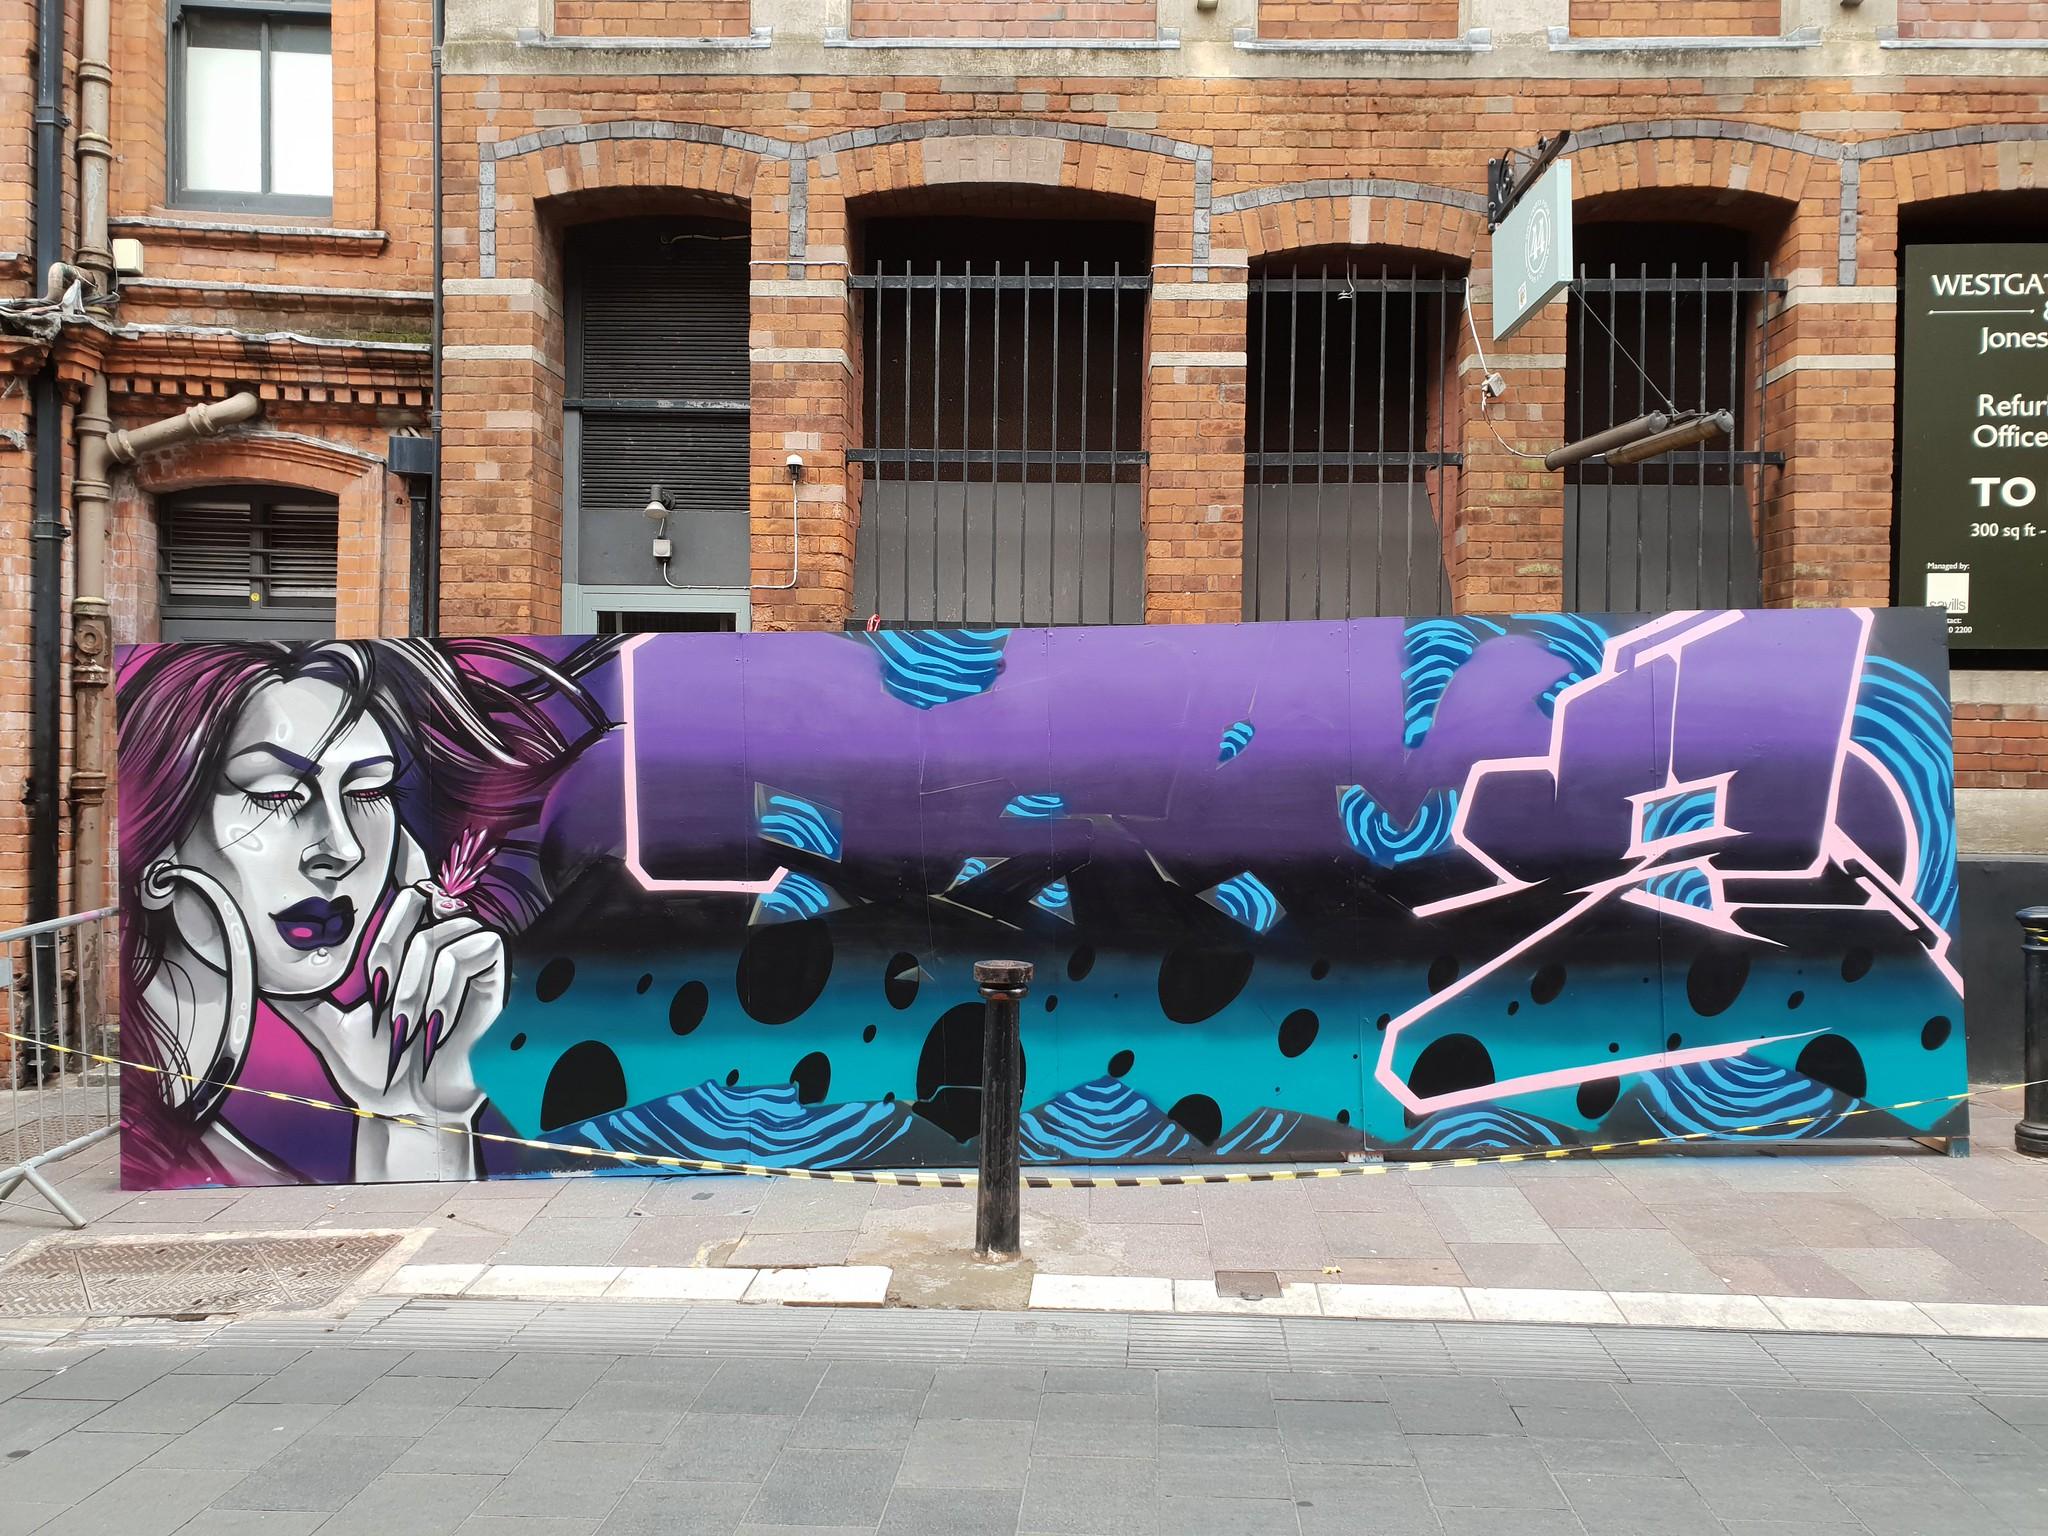 Hwb Pride street art, Cardiff